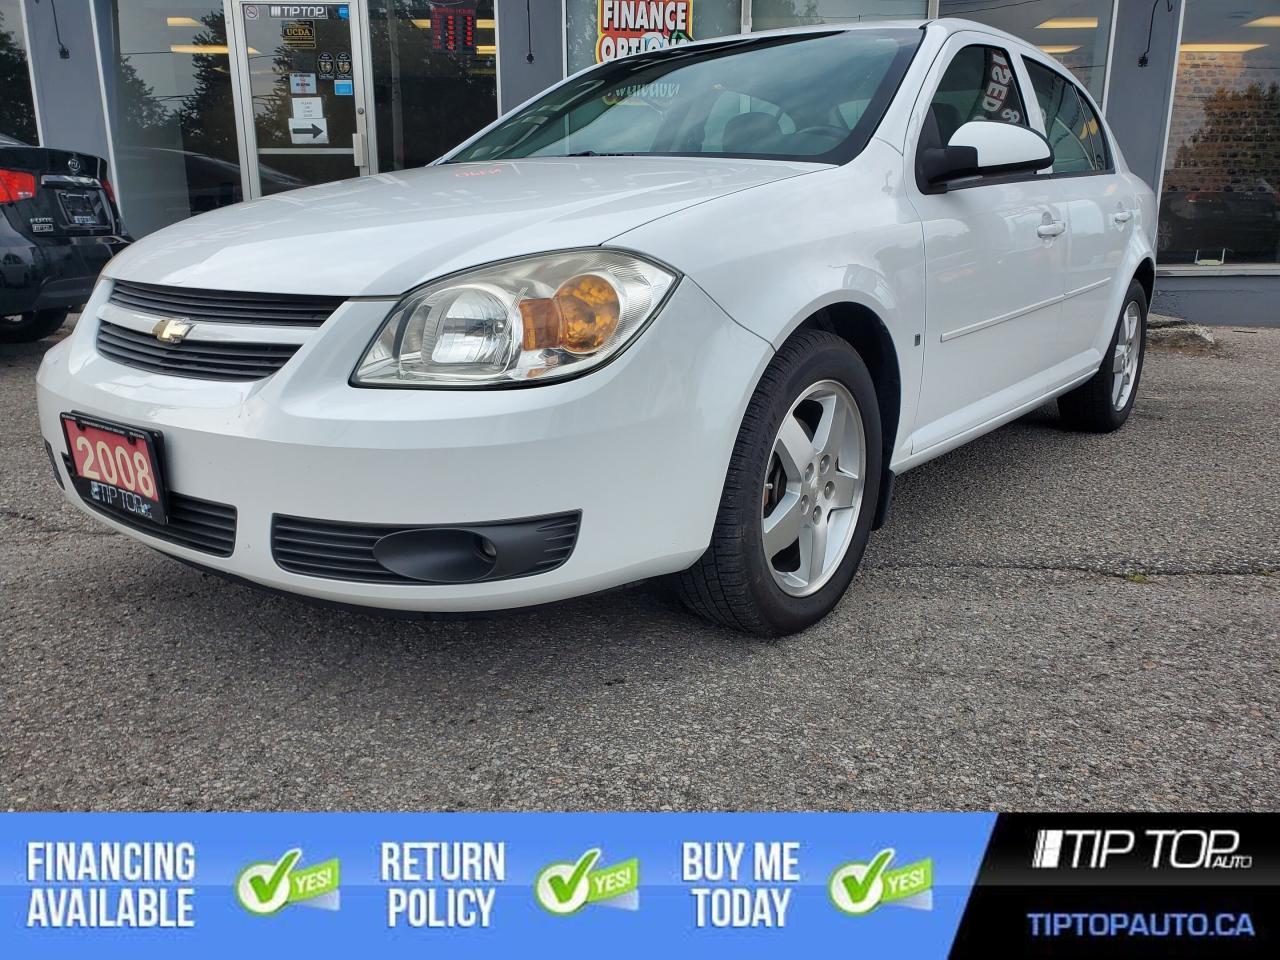 Used 2008 Chevrolet Cobalt LT for Sale in Bowmanville